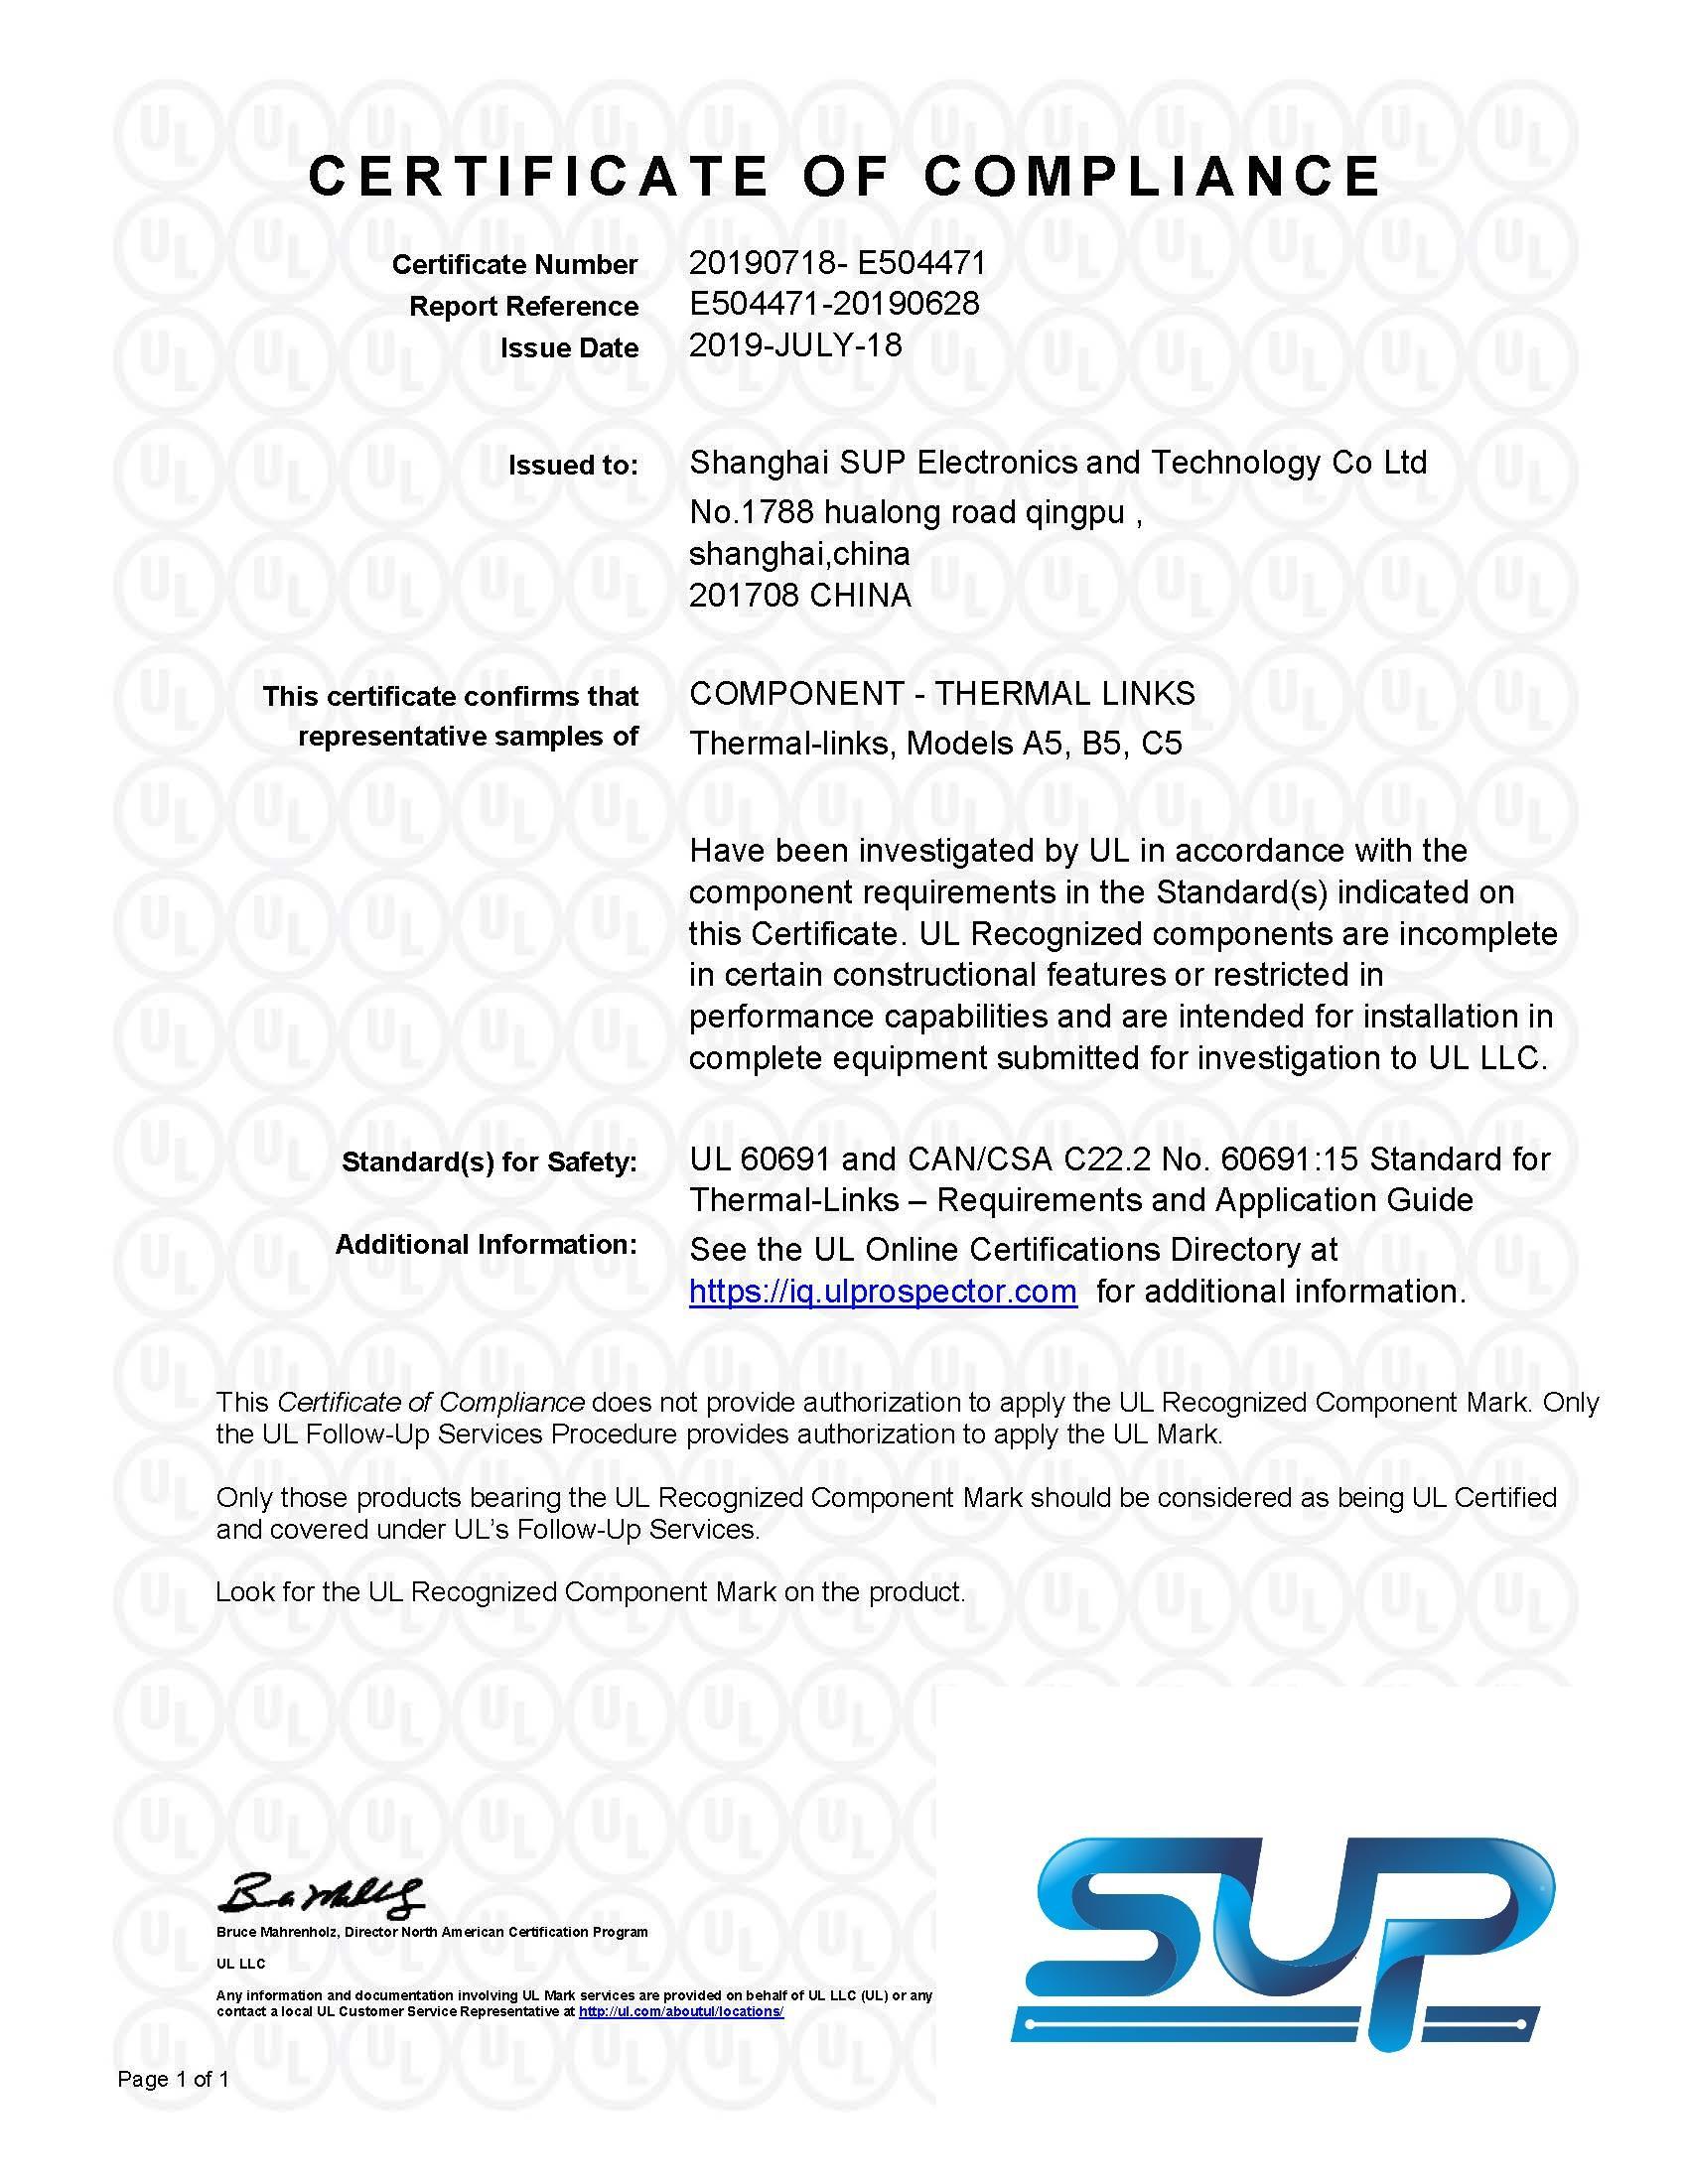 SUPfuse_UL_A5B5C51A2A3A130℃